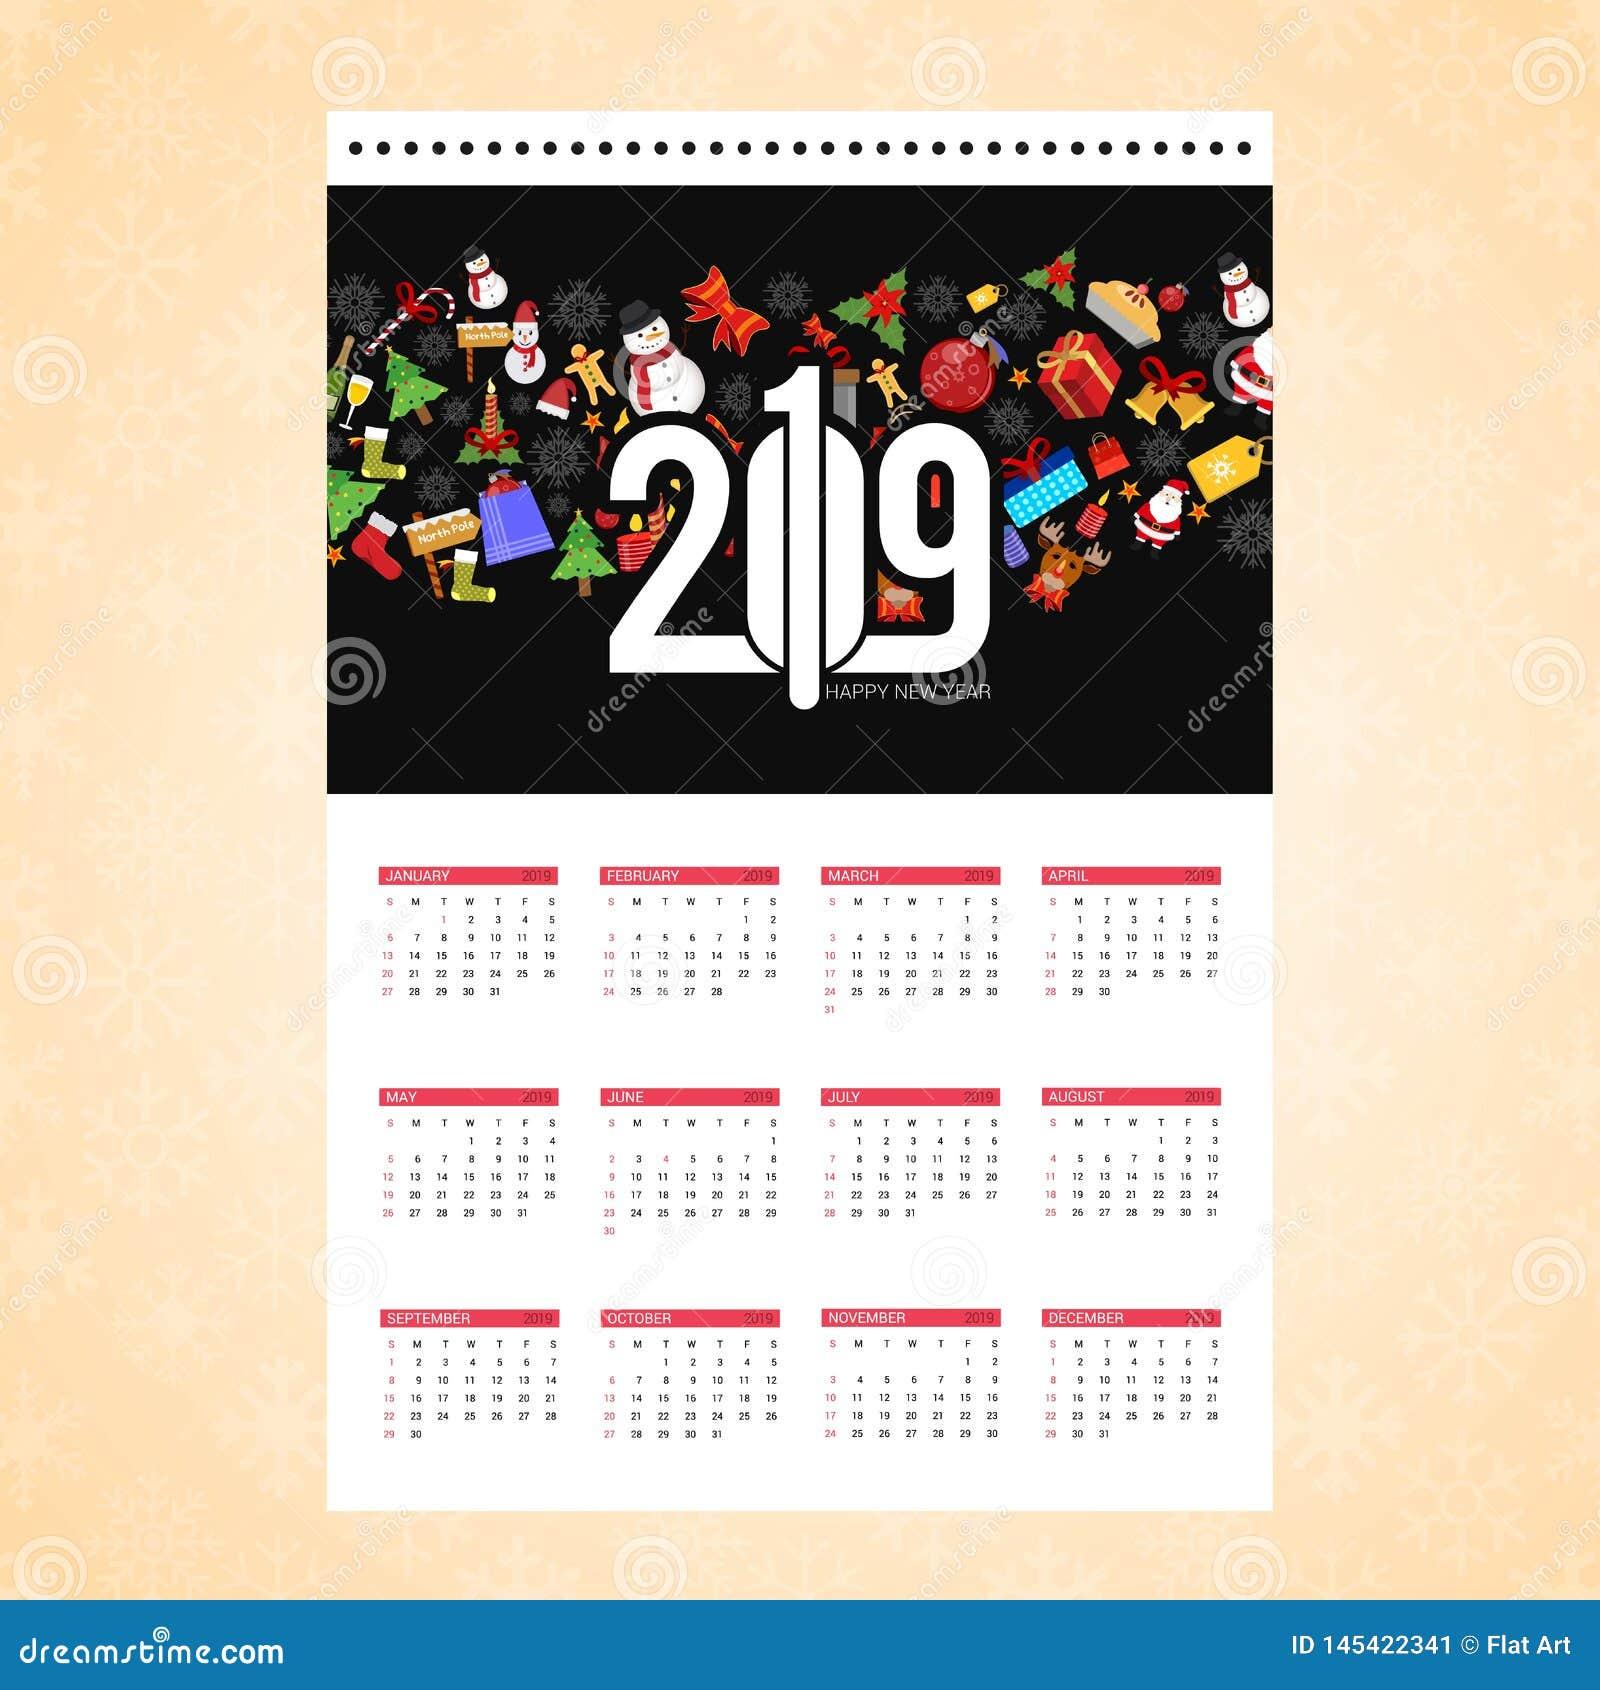 Christmas calendar design card with creative background vector